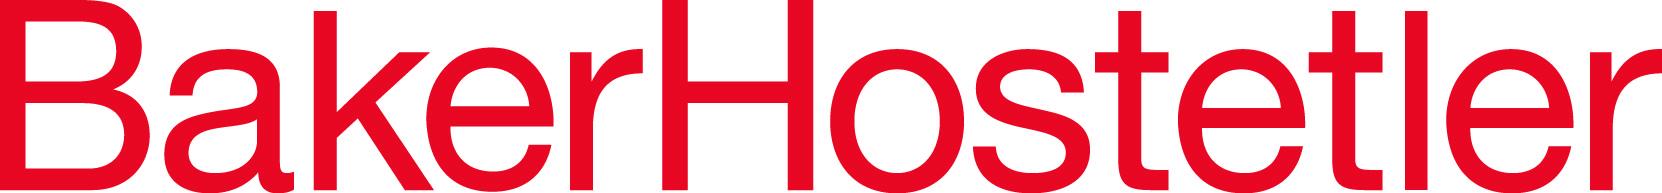 BH11003-logo_CMYK_Coated_FINAL.jpg